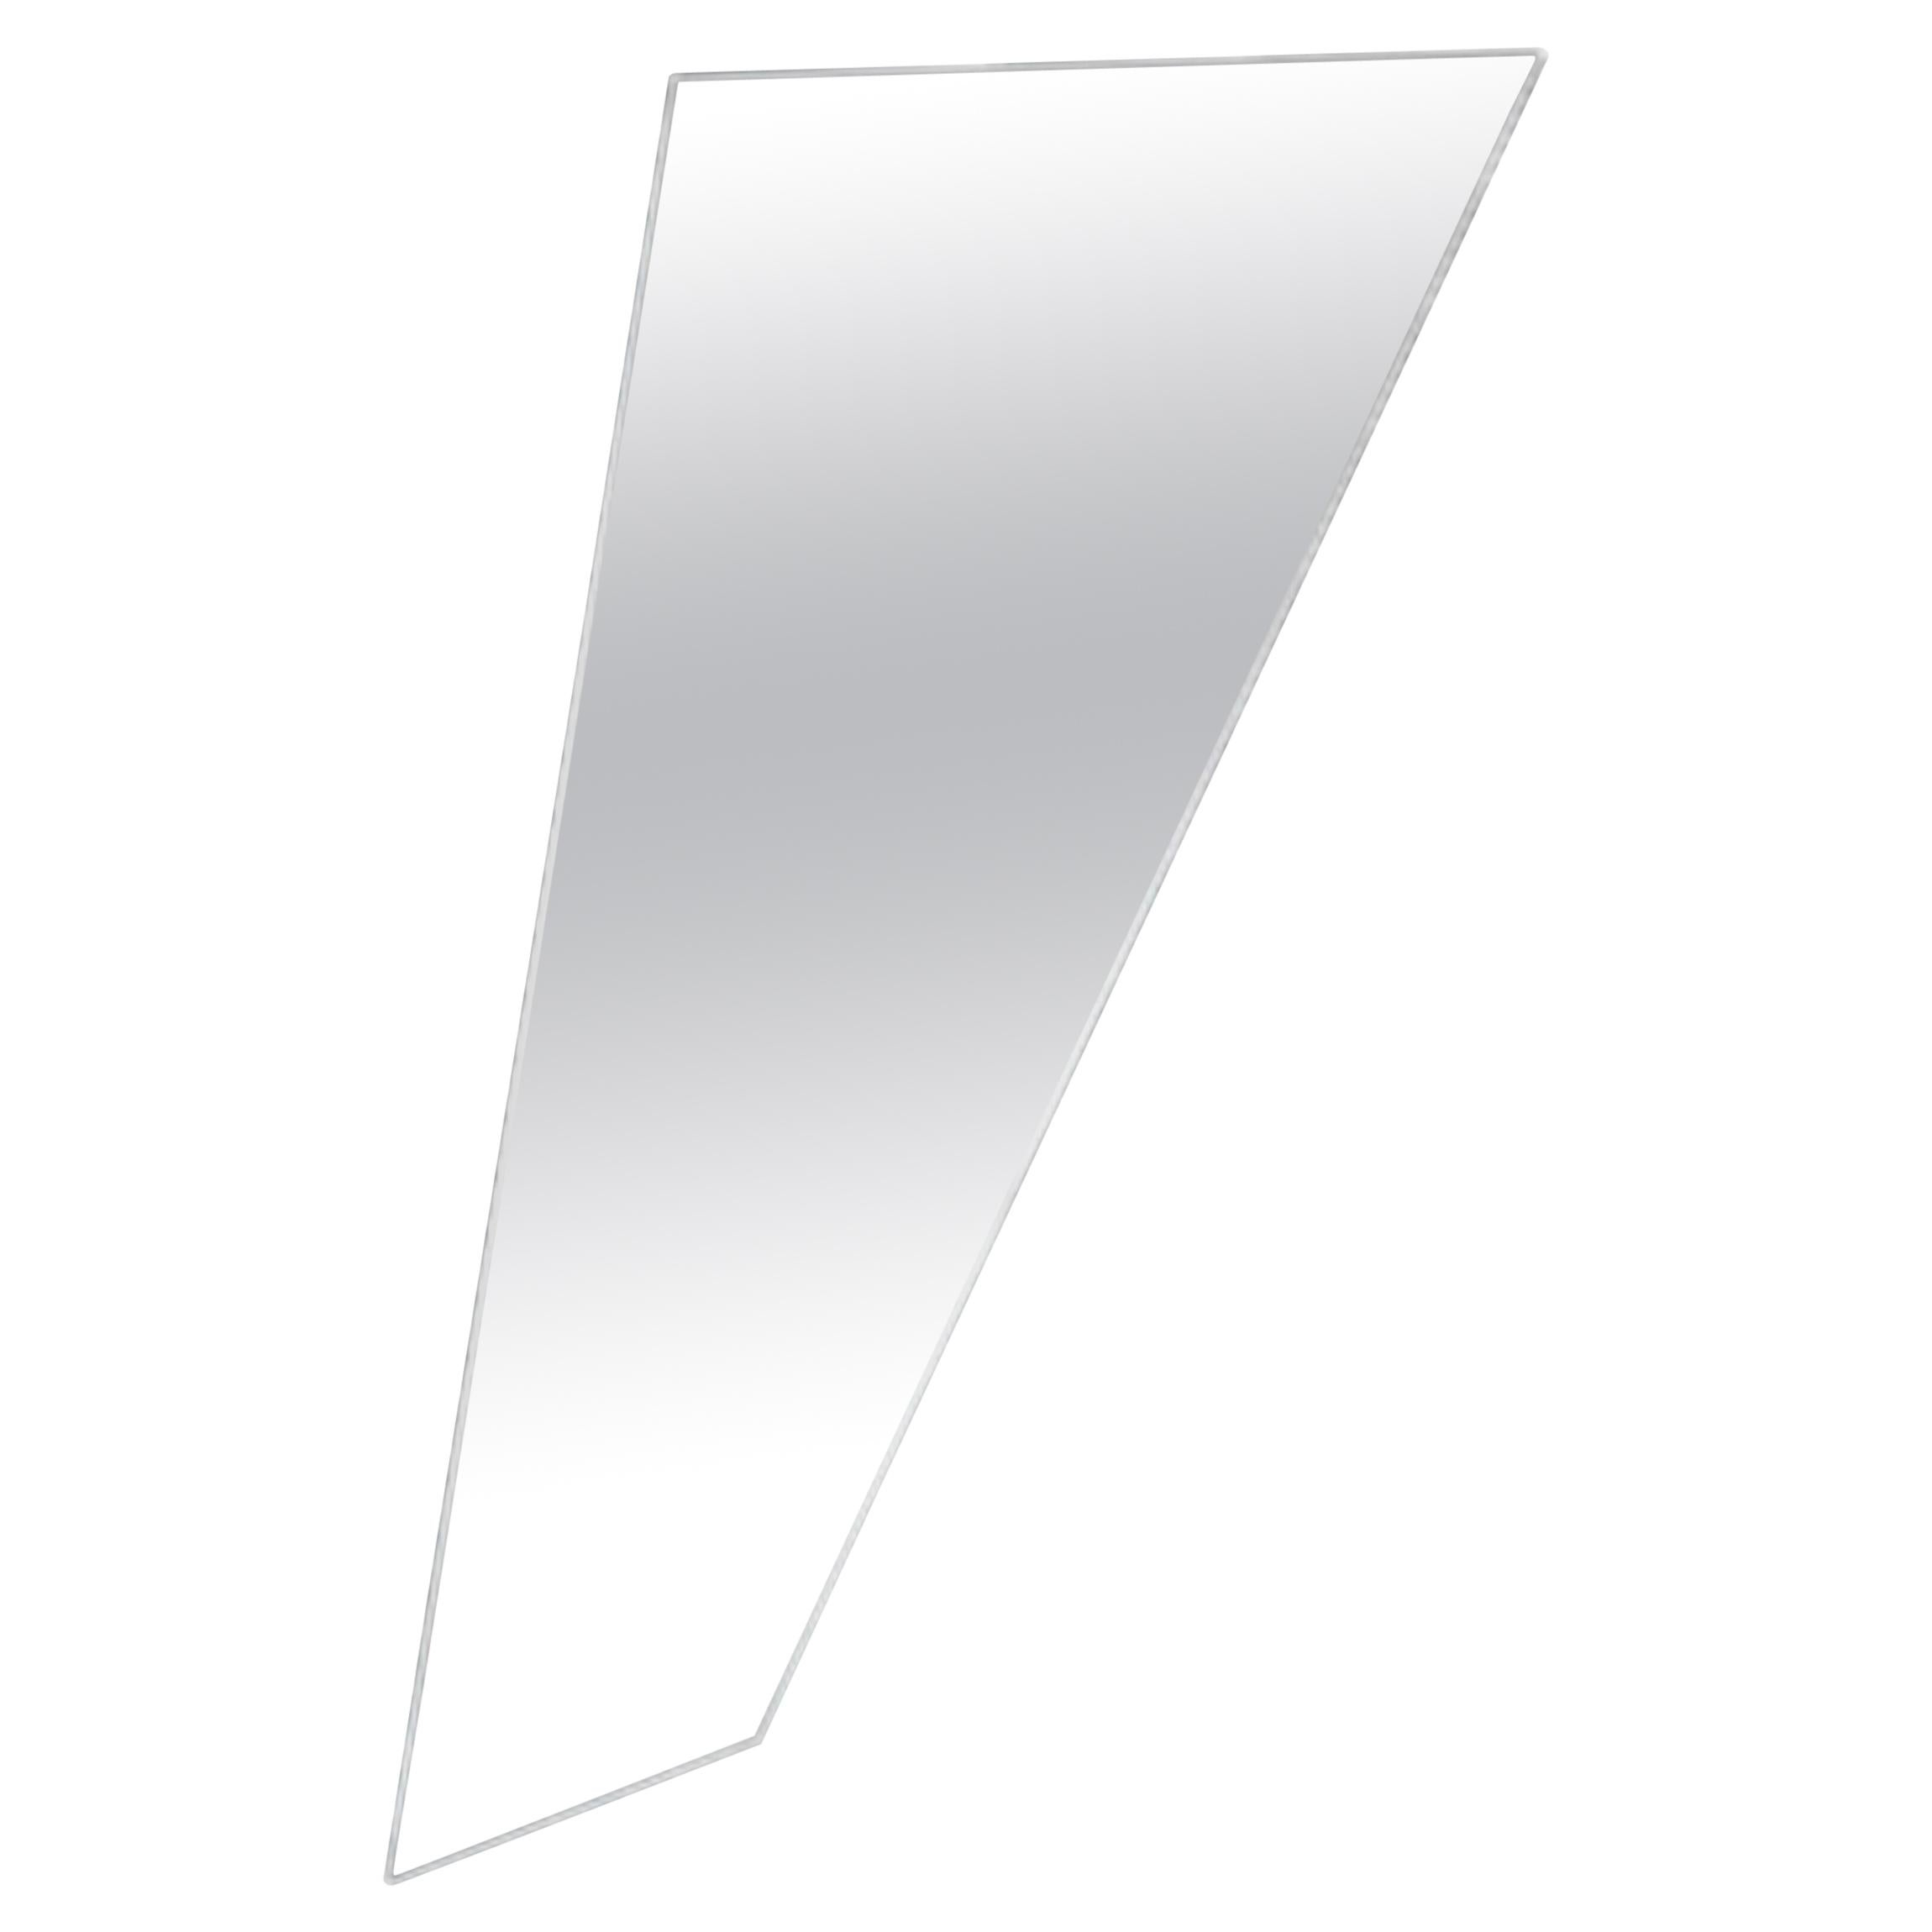 Fiam Mirage MI/D Wall Mirror in Glass, by Daniel Libeskind